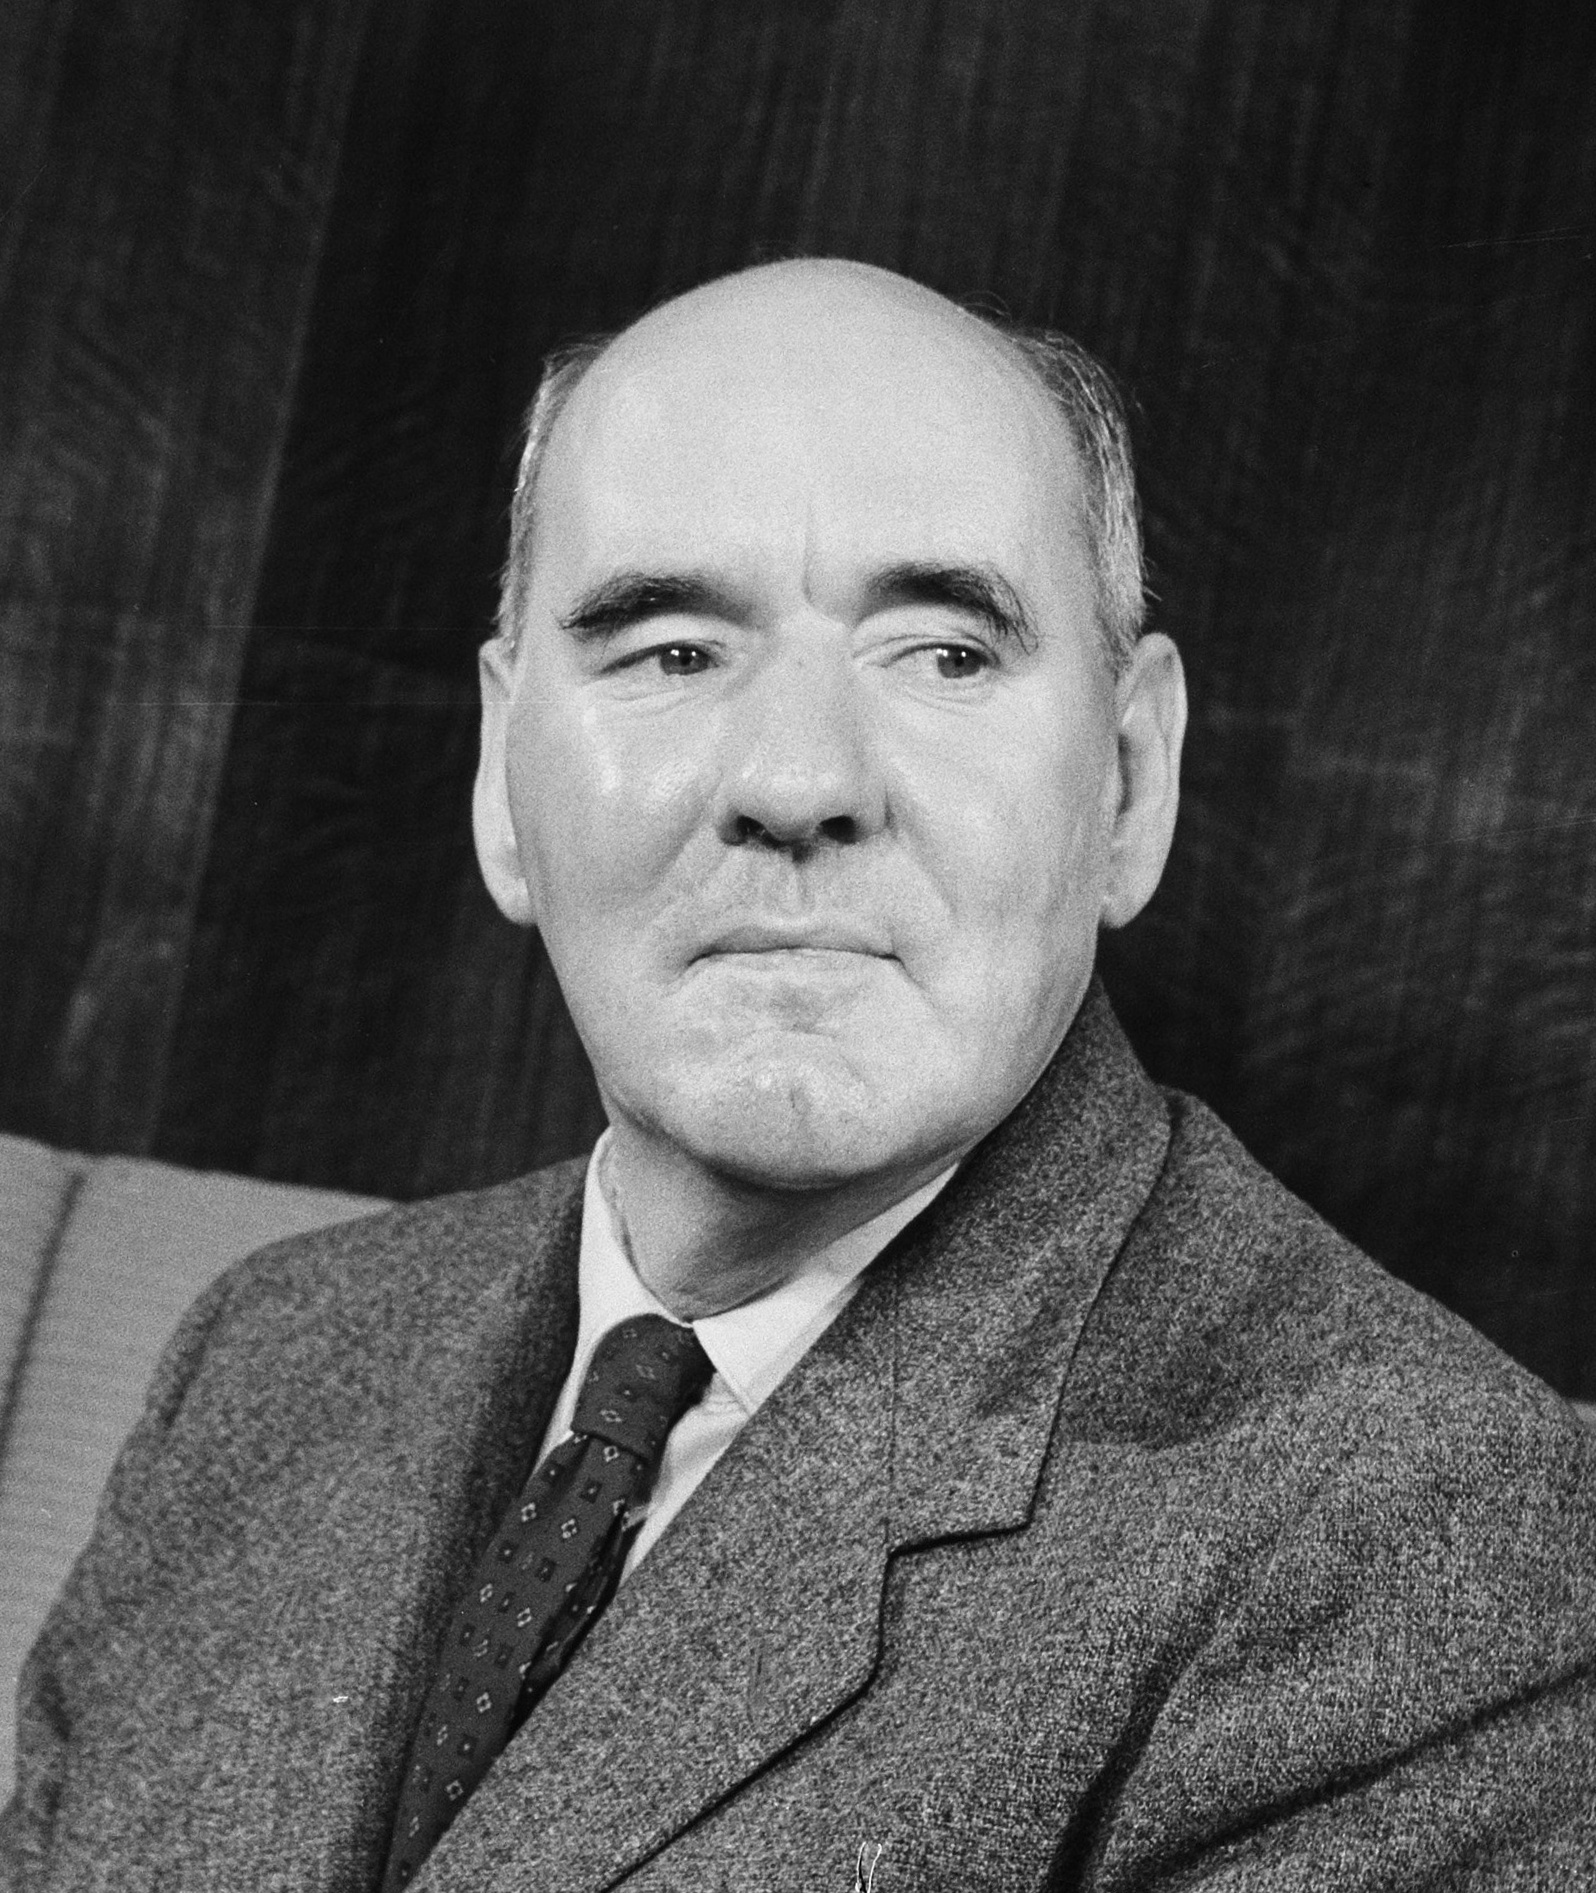 Parkinson in 1961